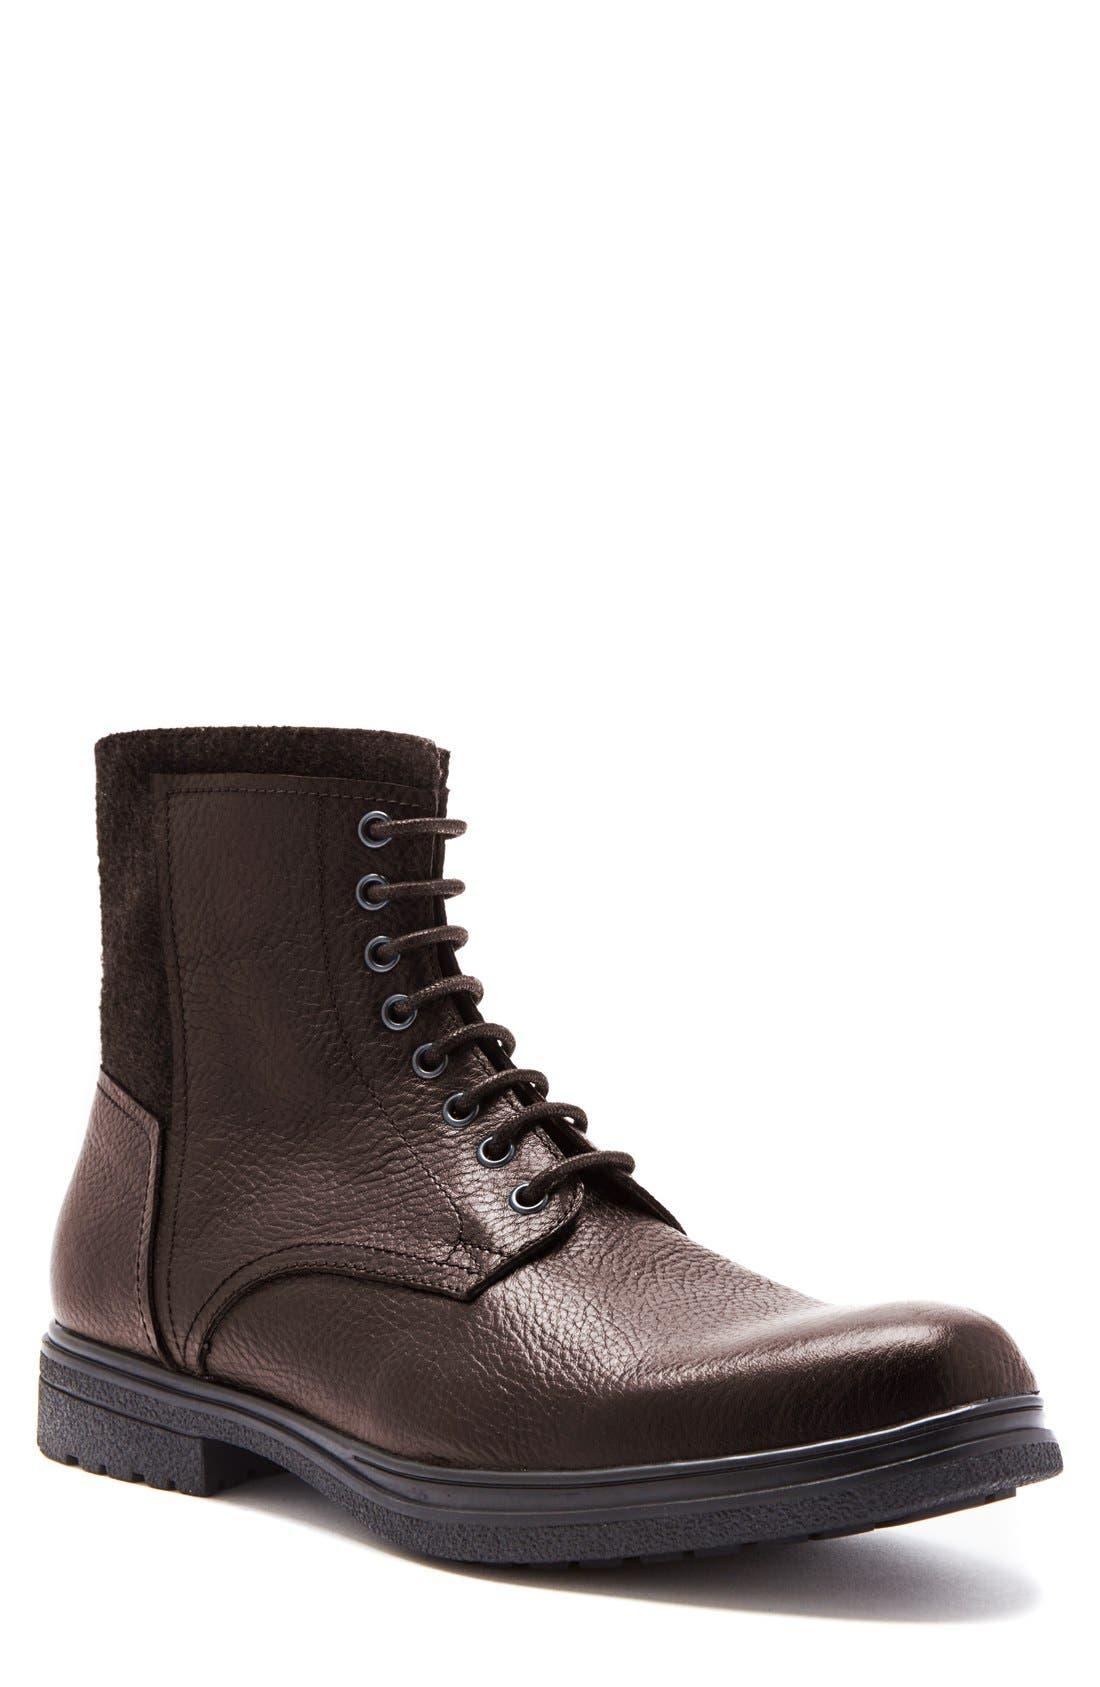 'Backoff' Waterproof Plain Toe Boot,                             Main thumbnail 1, color,                             200